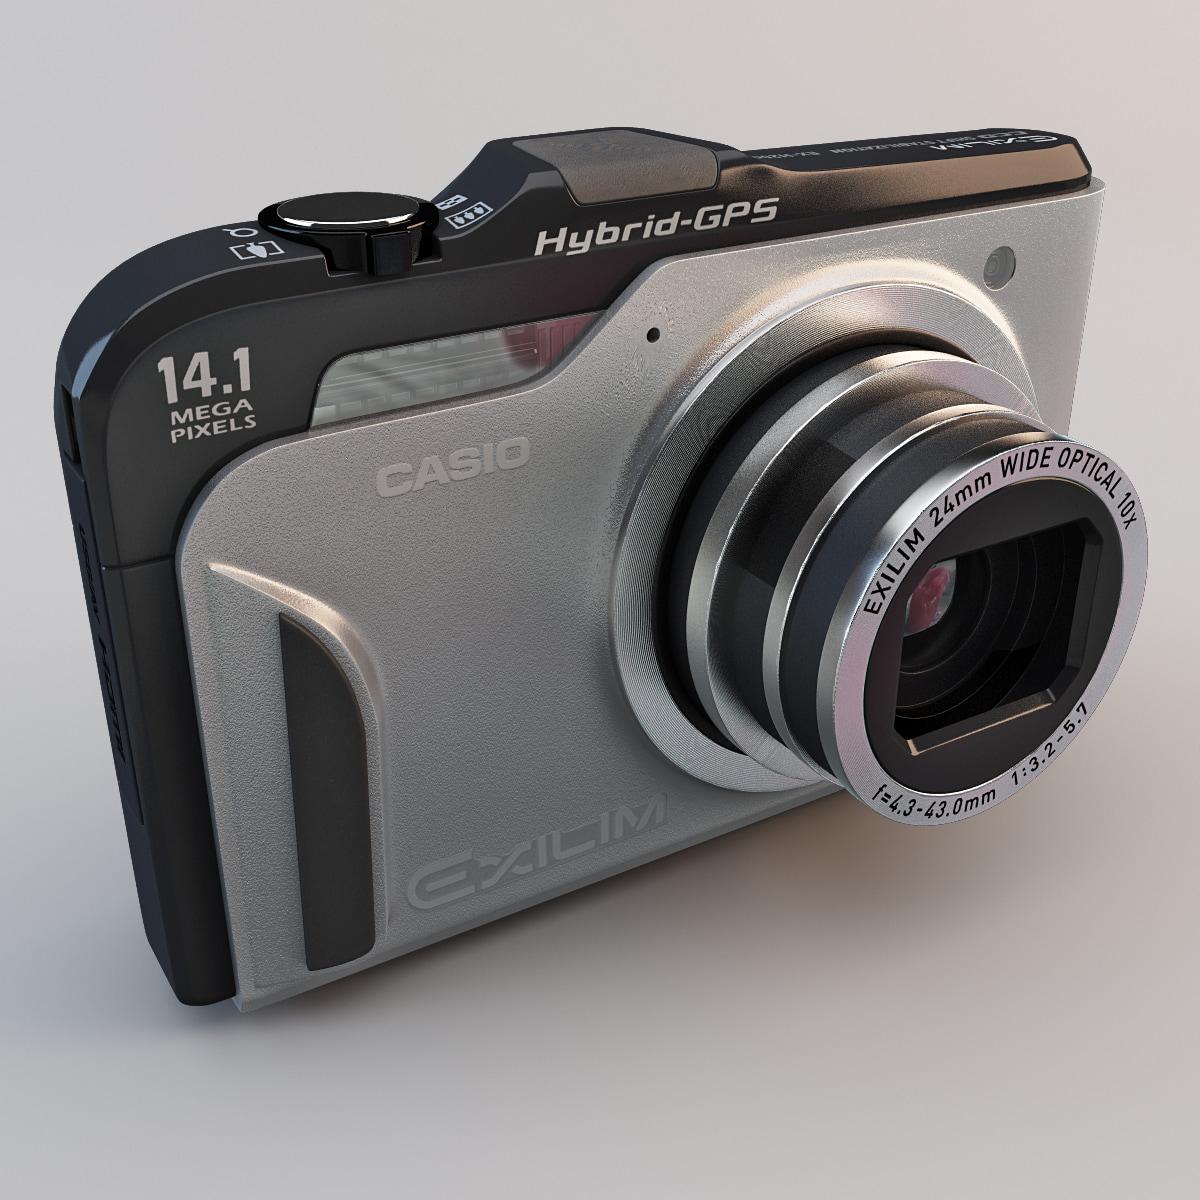 Digital Camera Casio Exilim Ex-h20g